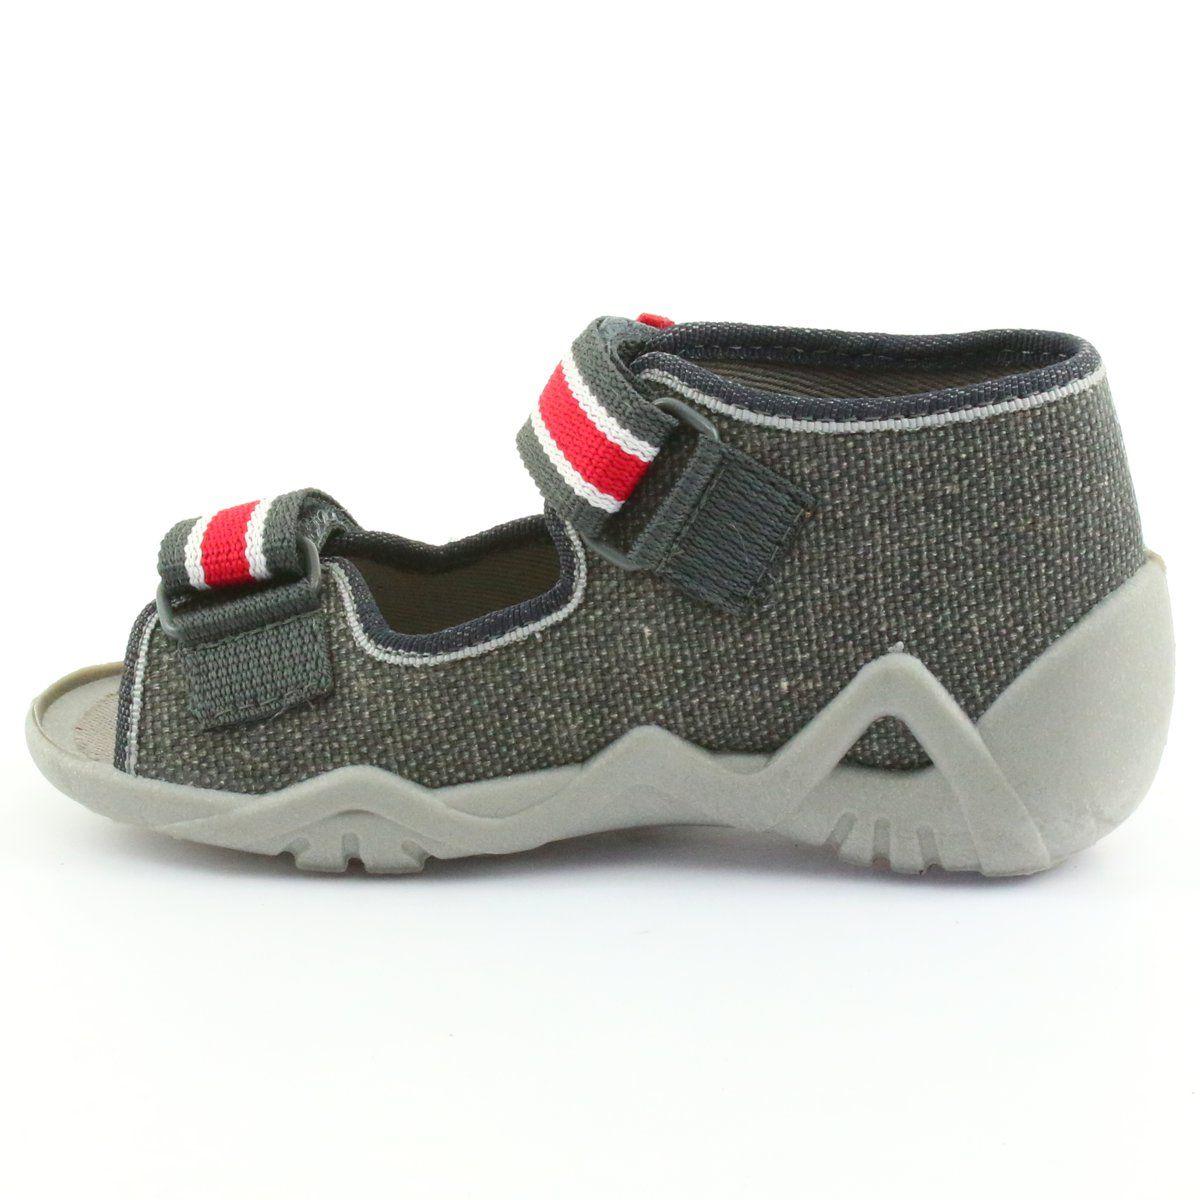 Kapcie Chlopiece Napa Befado 250p089 Szare Czerwone Baby Shoes Shoes Fashion